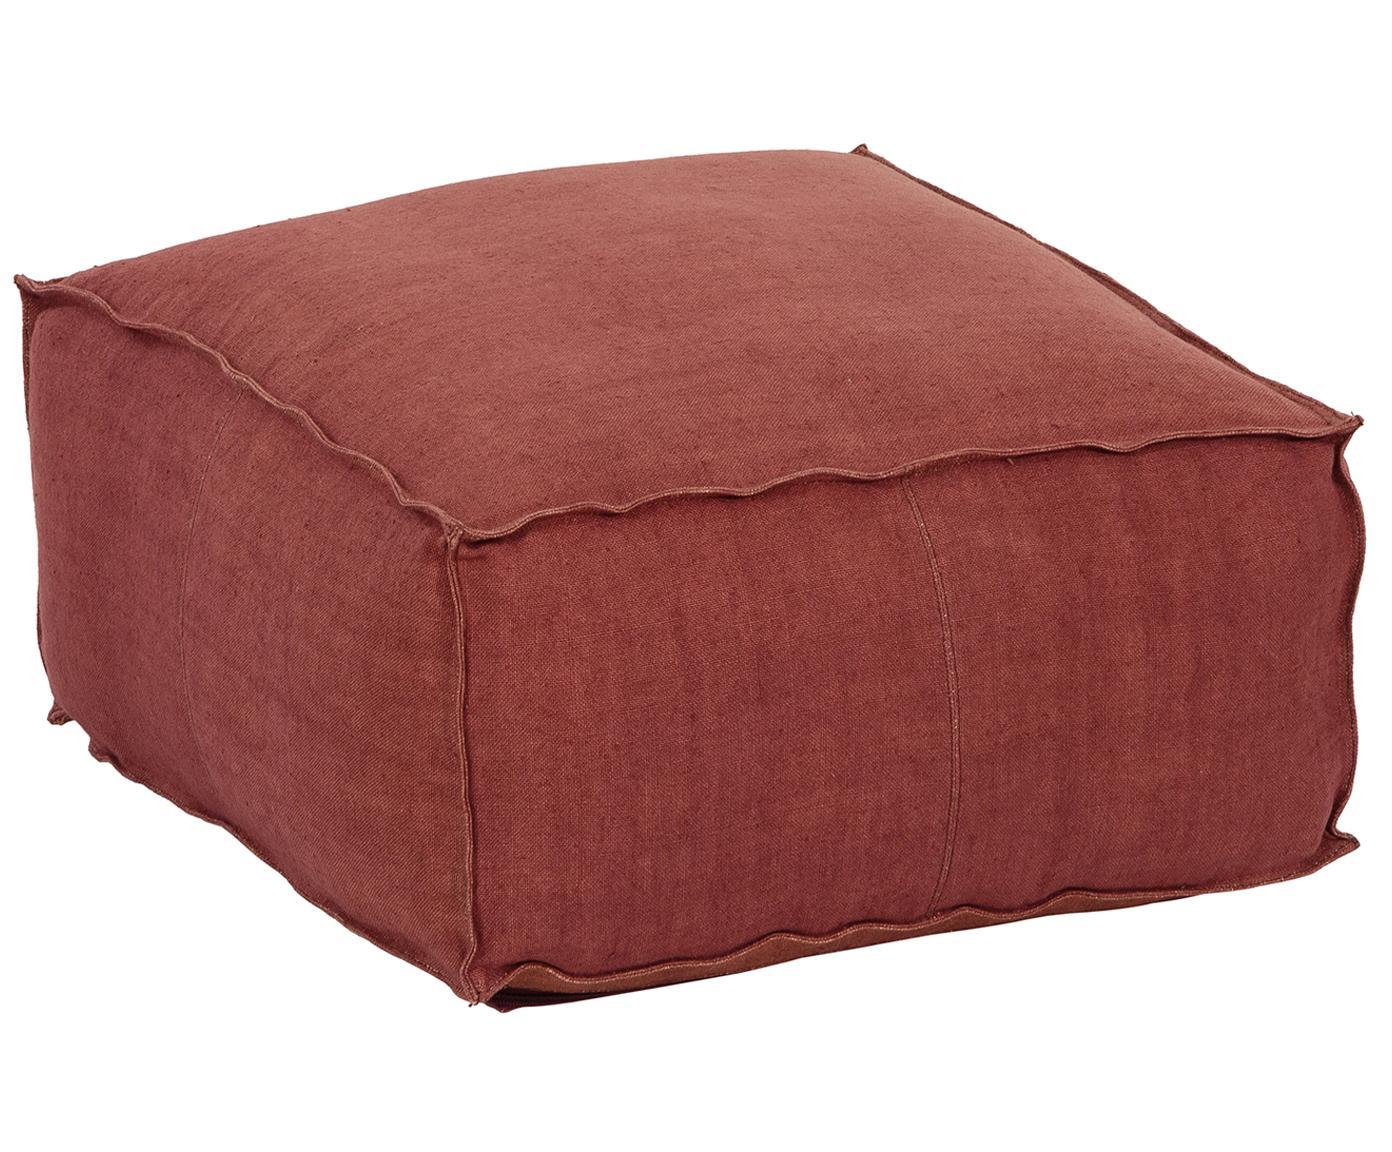 Handgemaakt linnen vloerkussen Saffron, Bekleding: linnen, Onderzijde: katoen, Roodbruin, 50 x 25 cm